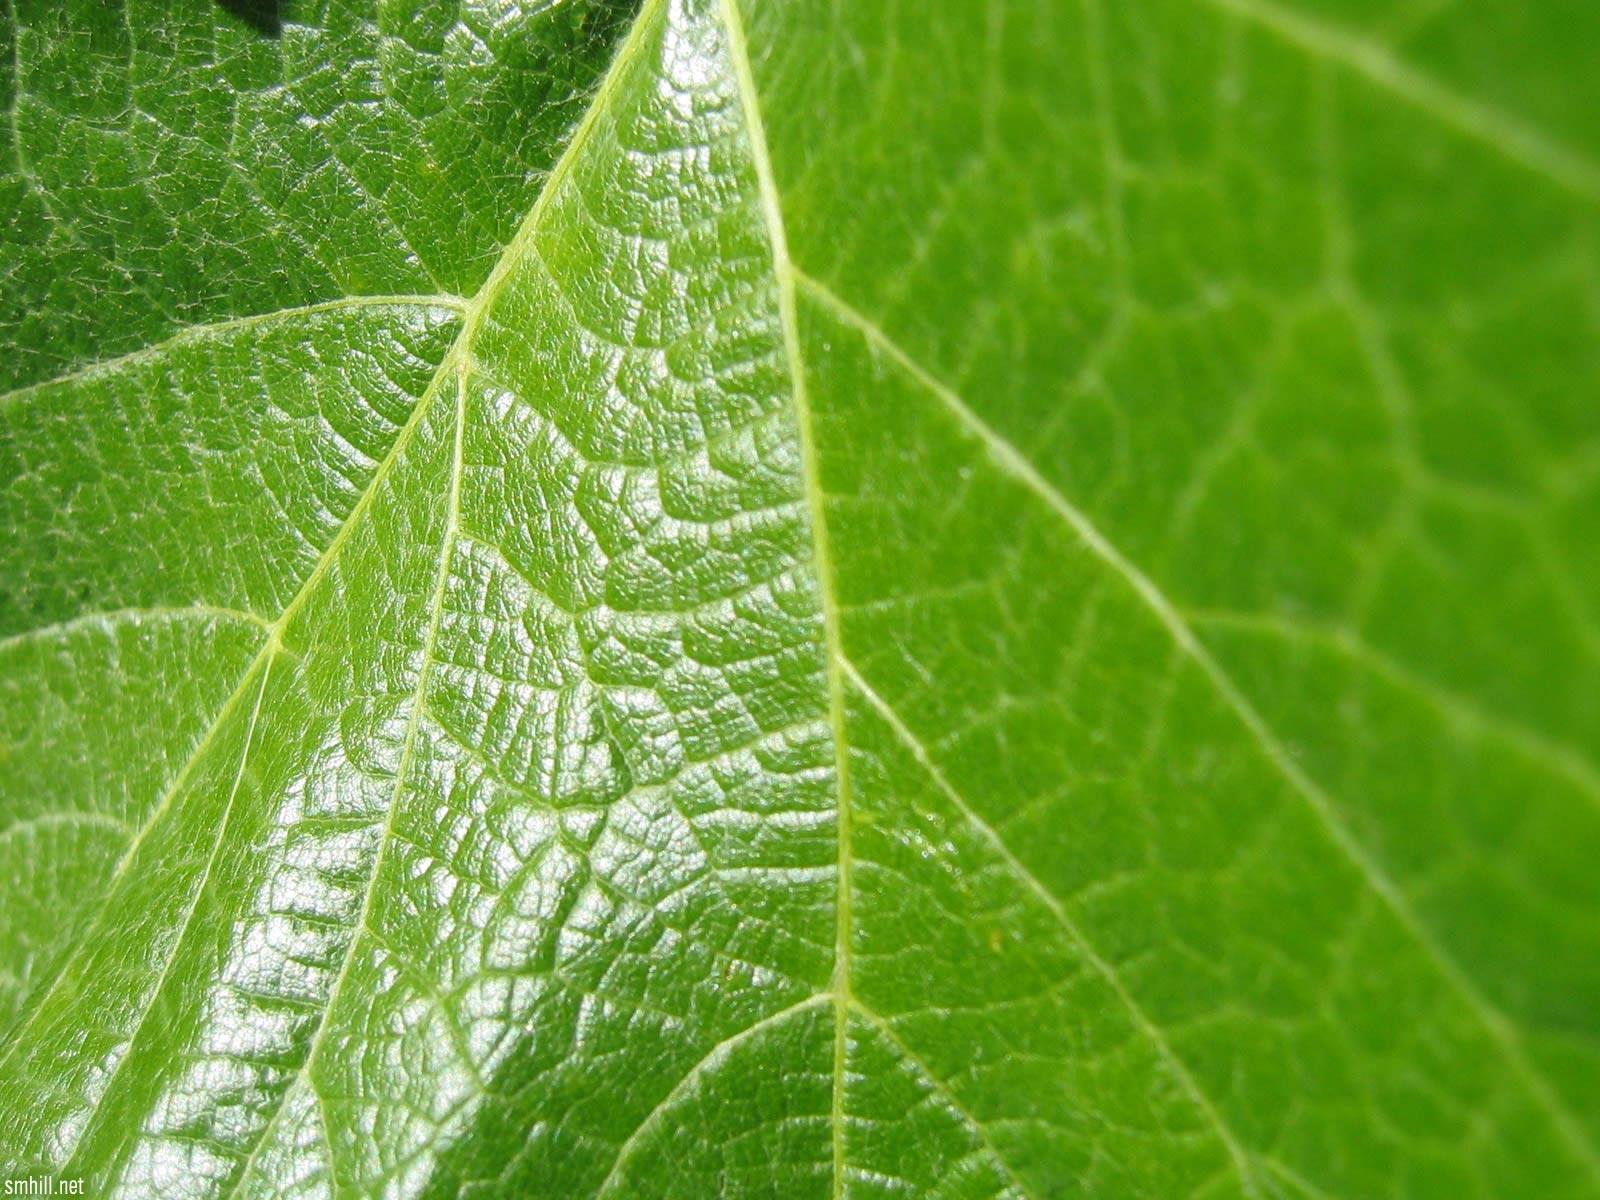 Fond d 39 ecran zoom plante verte wallpaper for La plante verte